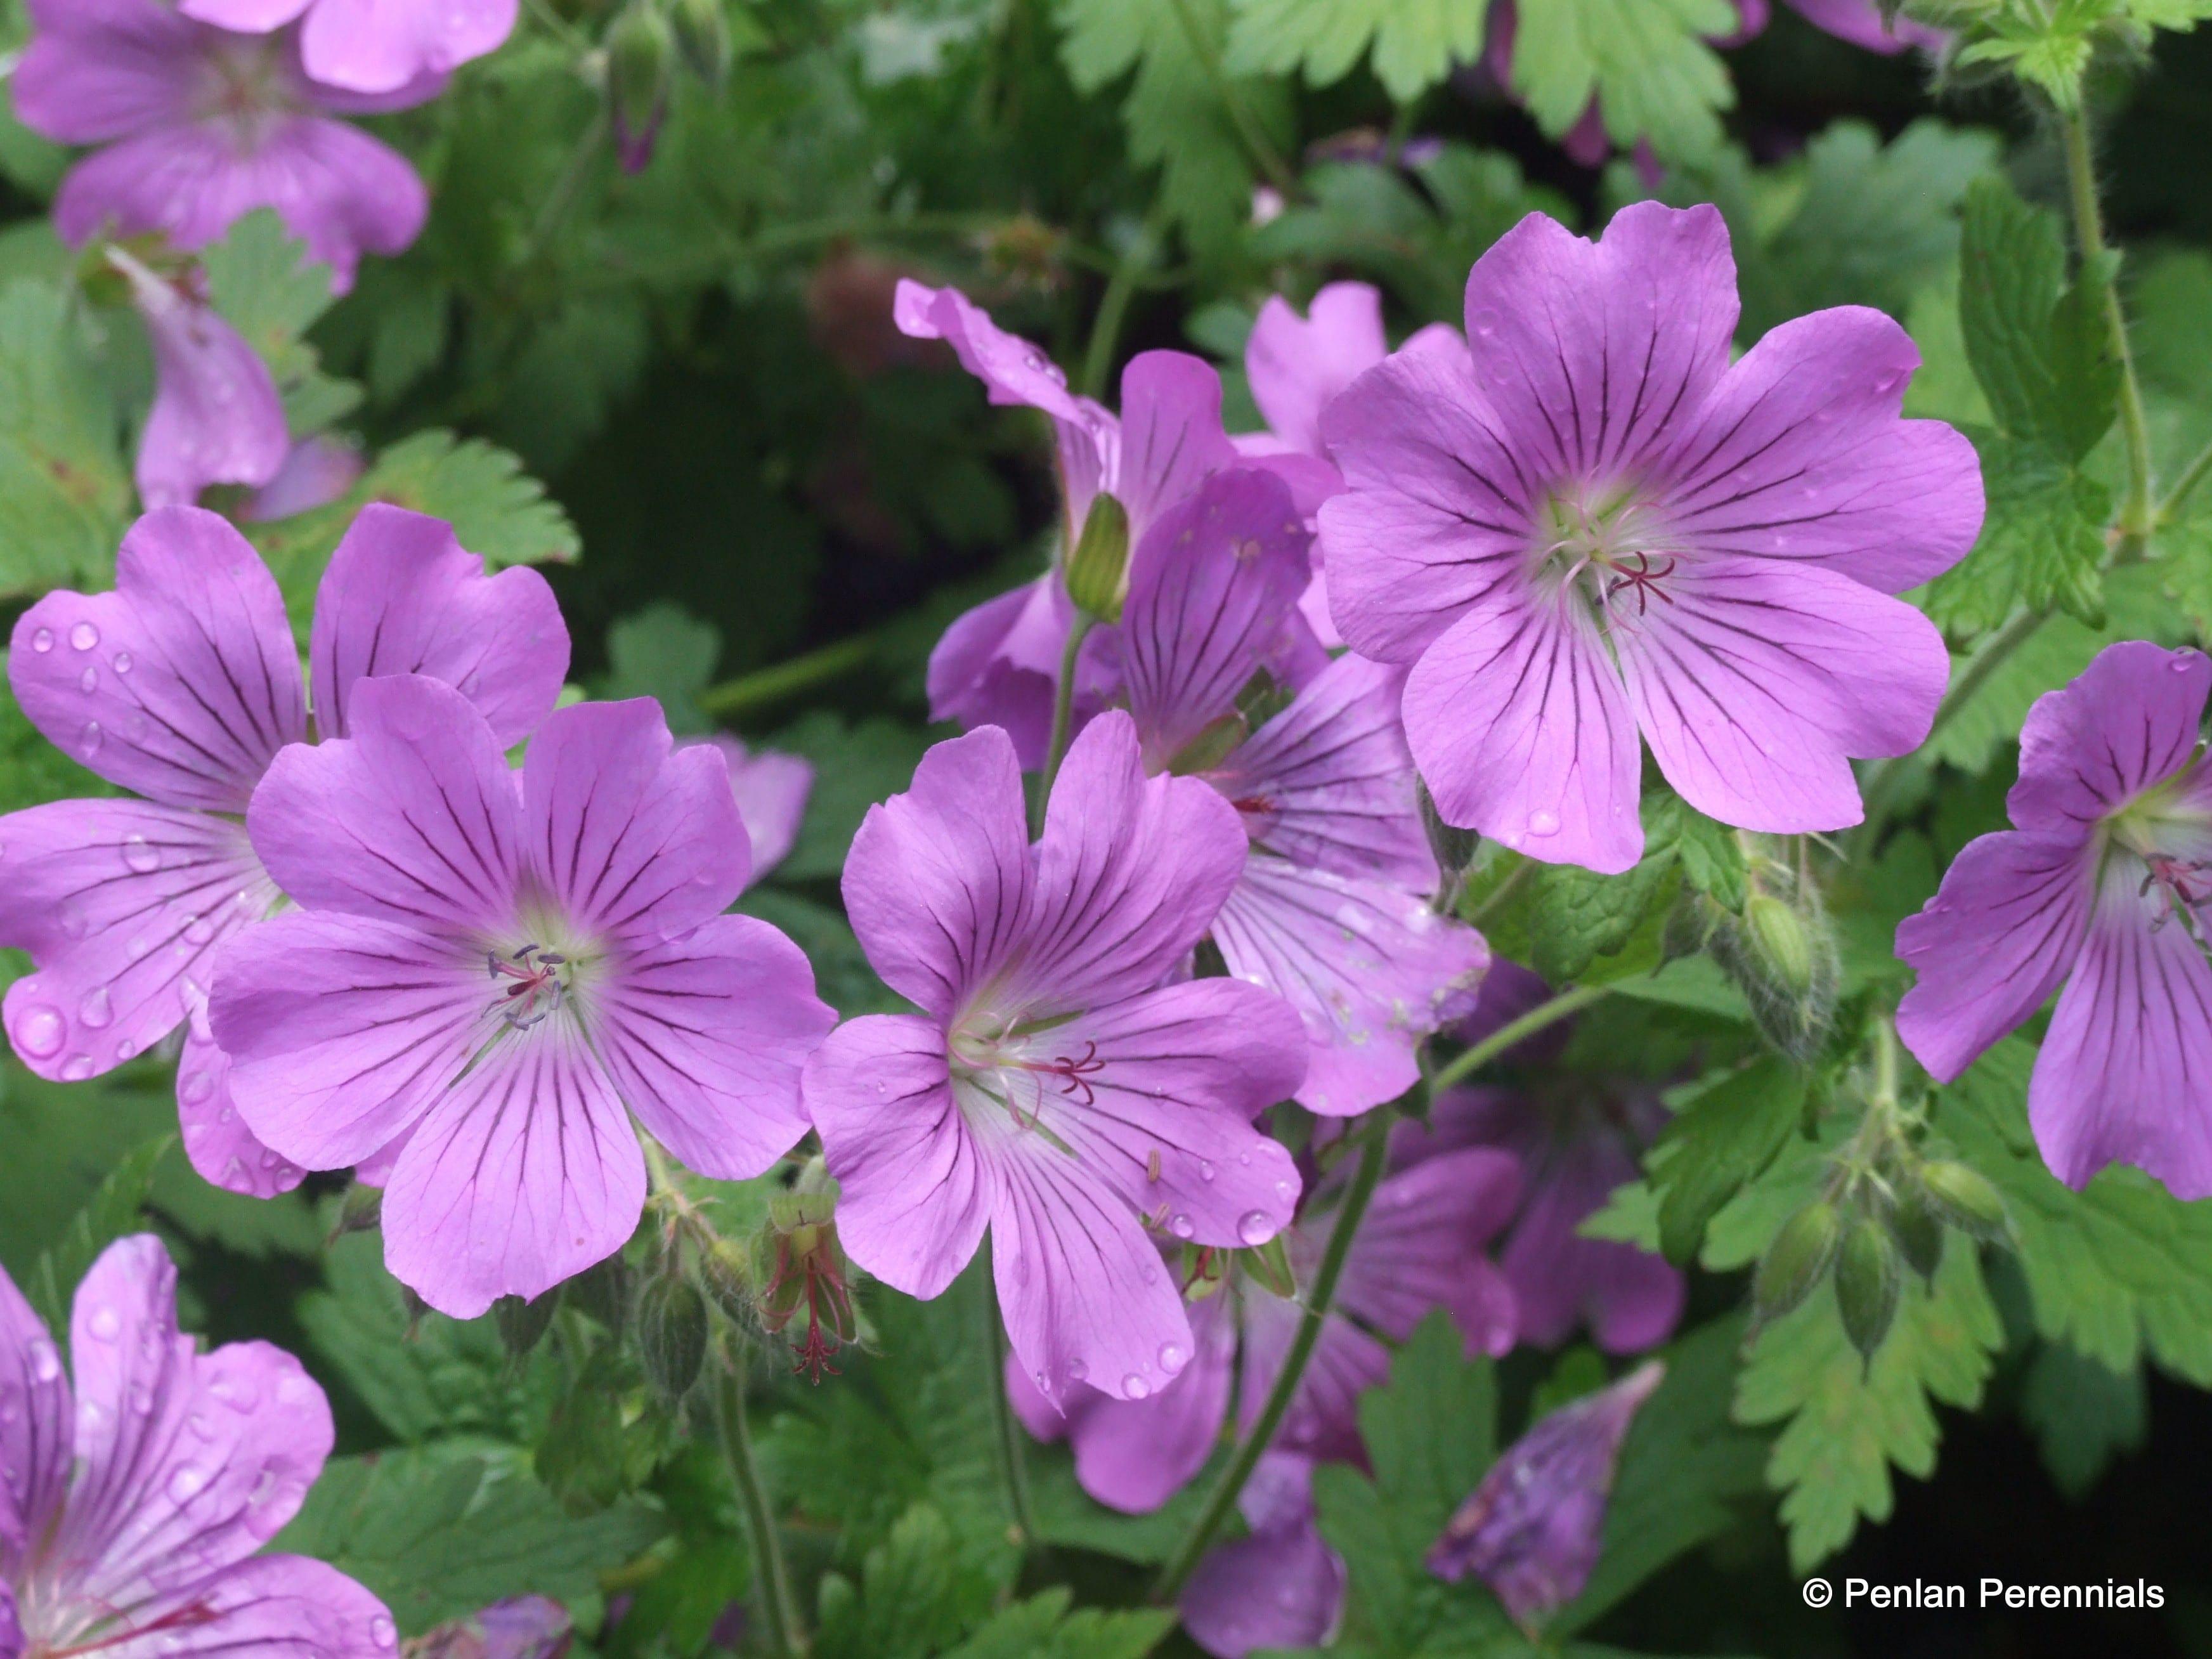 Geranium Sirak on Plants Around Us